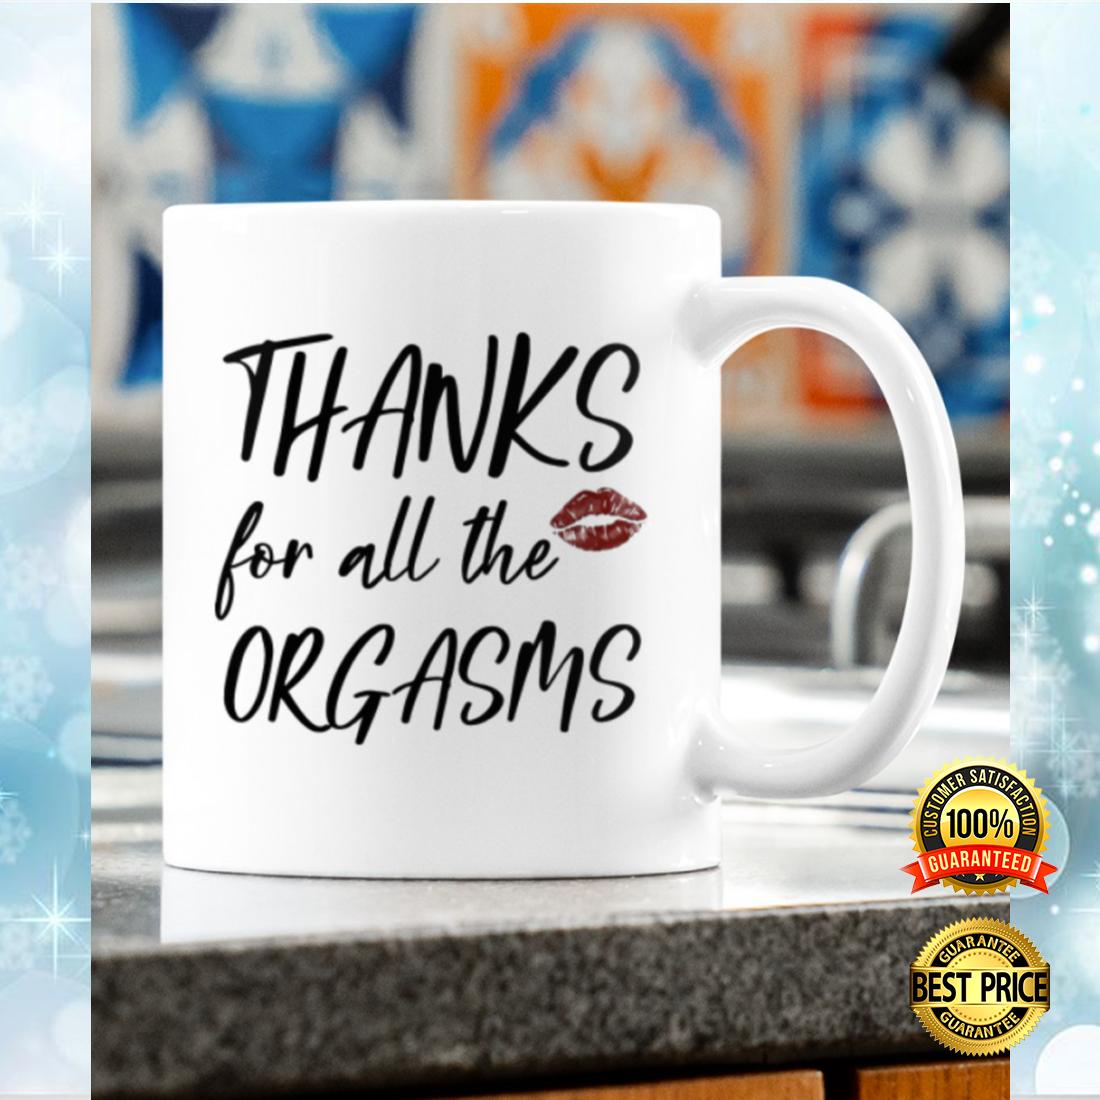 Thanks for all the orgasms mug 4